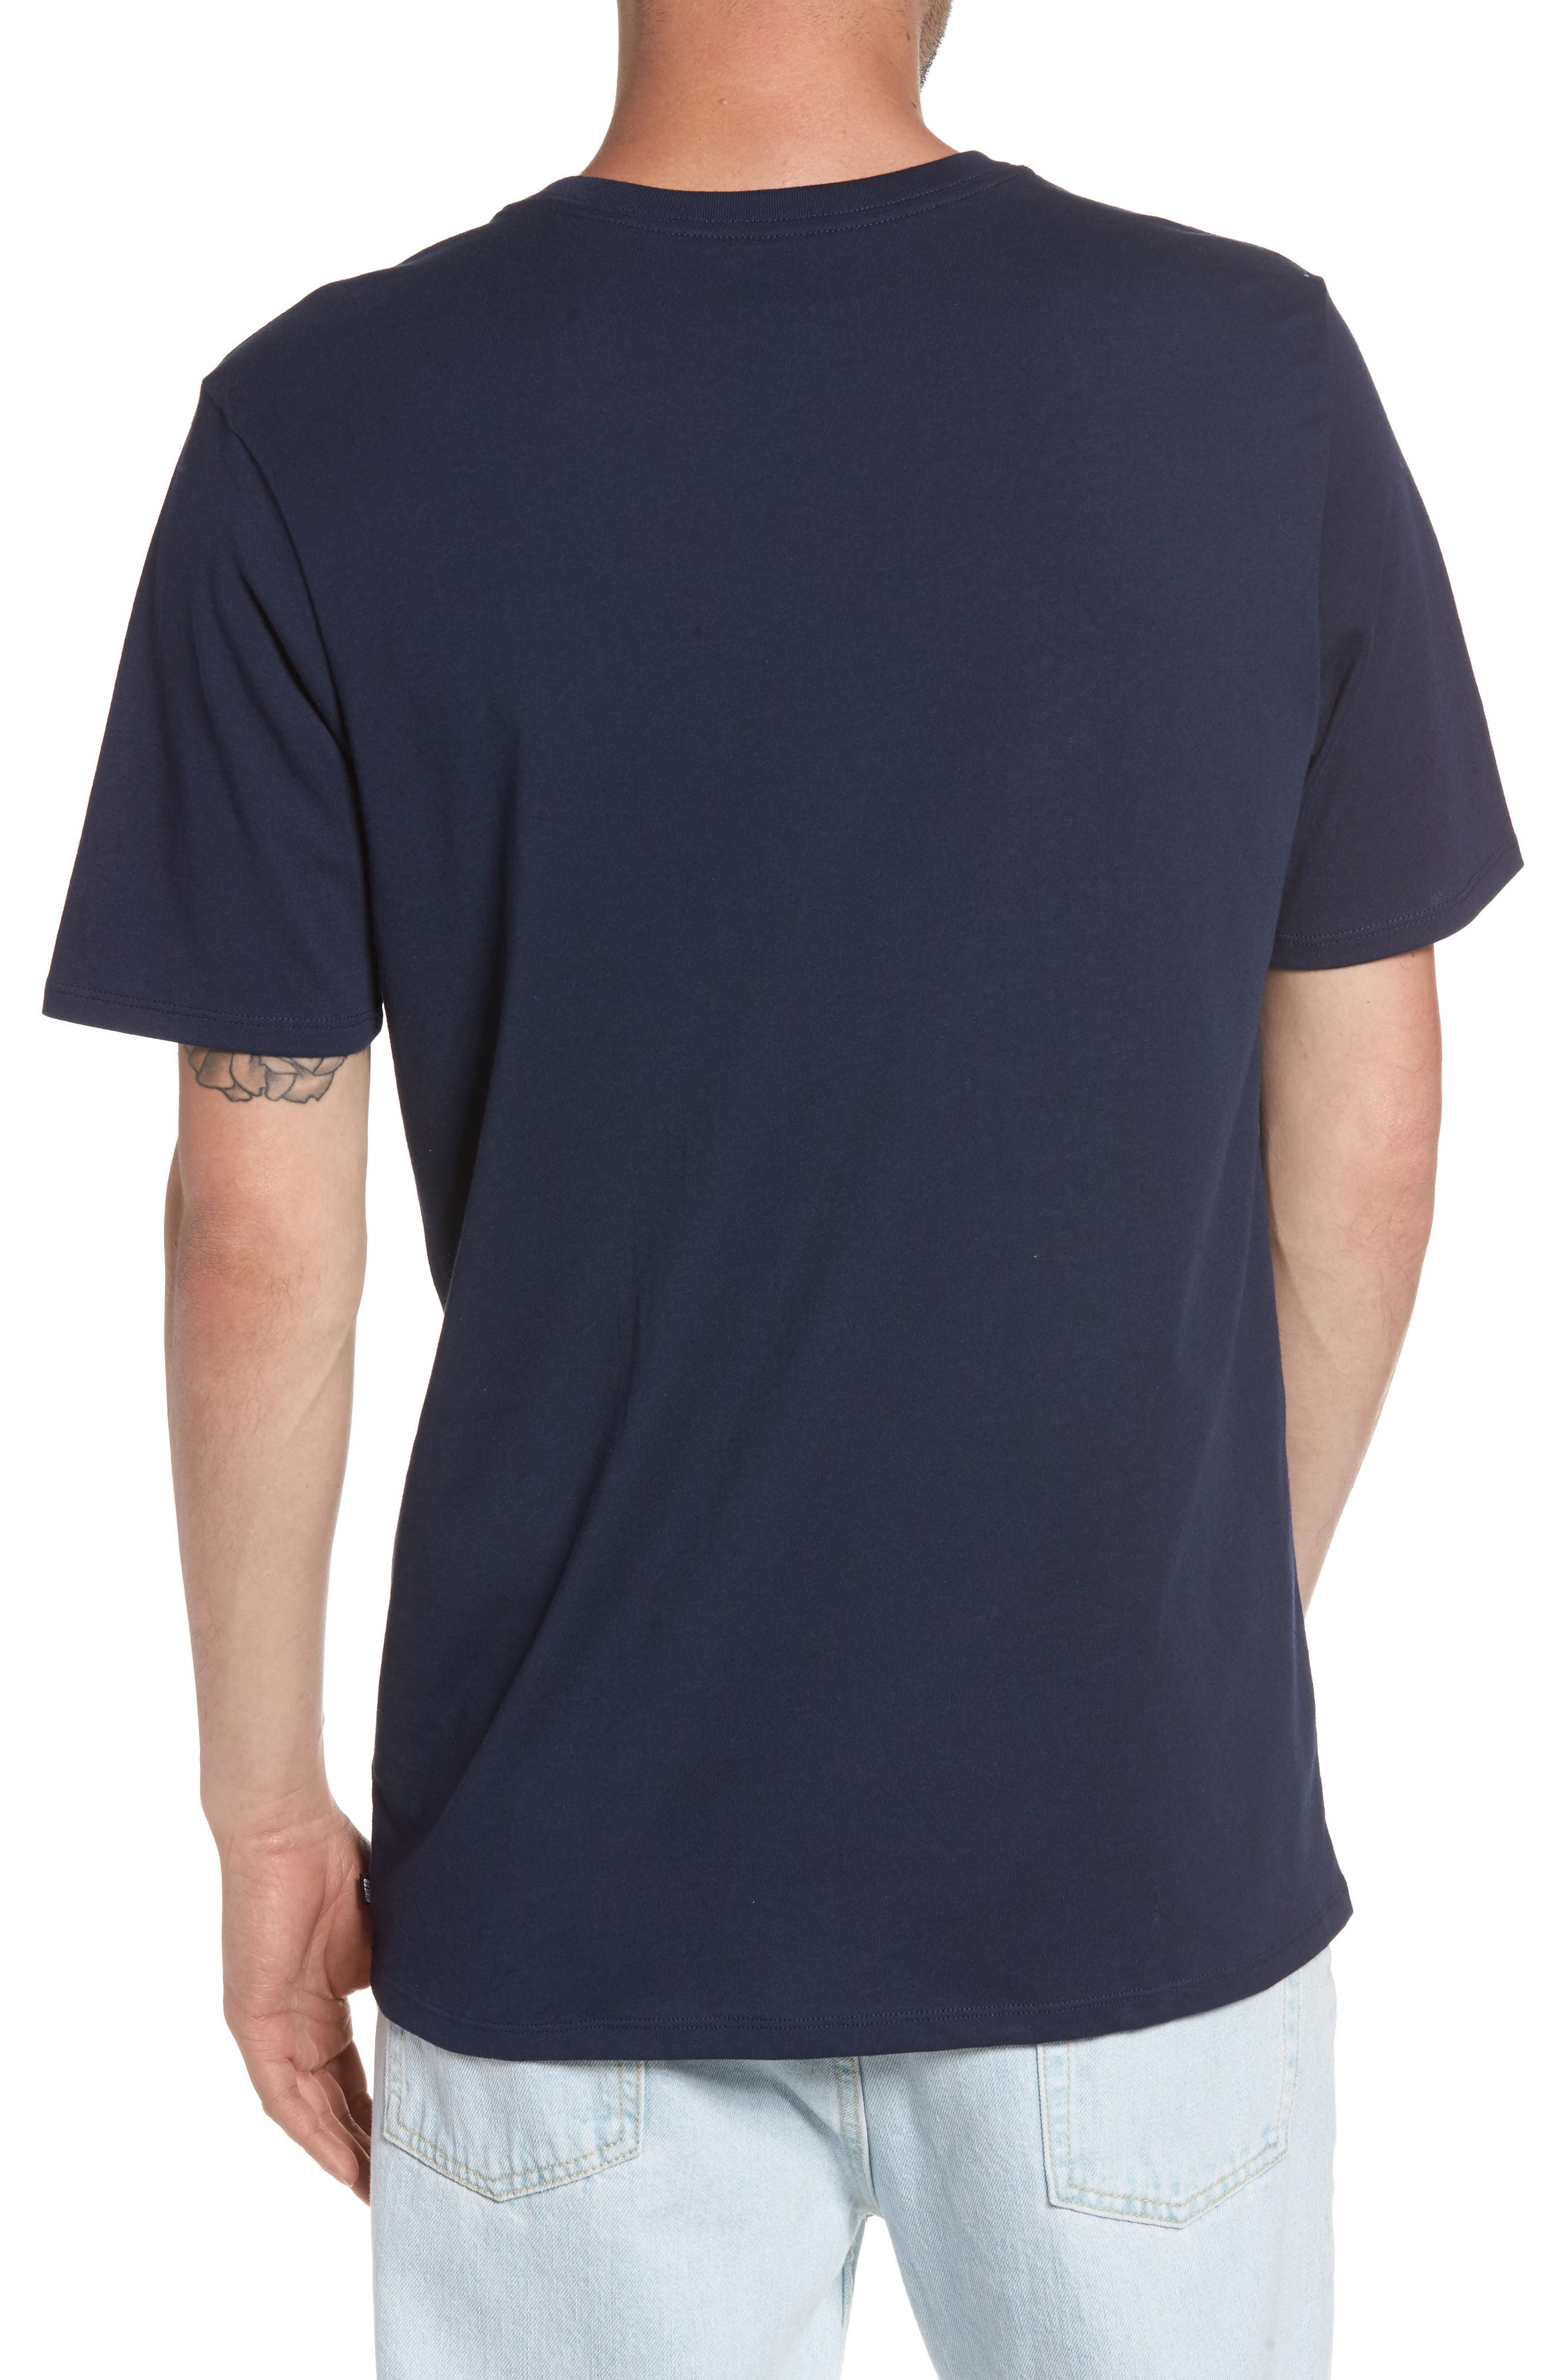 Nike 'SB Logo' T-Shirt,                             Alternate thumbnail 2, color,                             Obsidian/ Mineral Gold